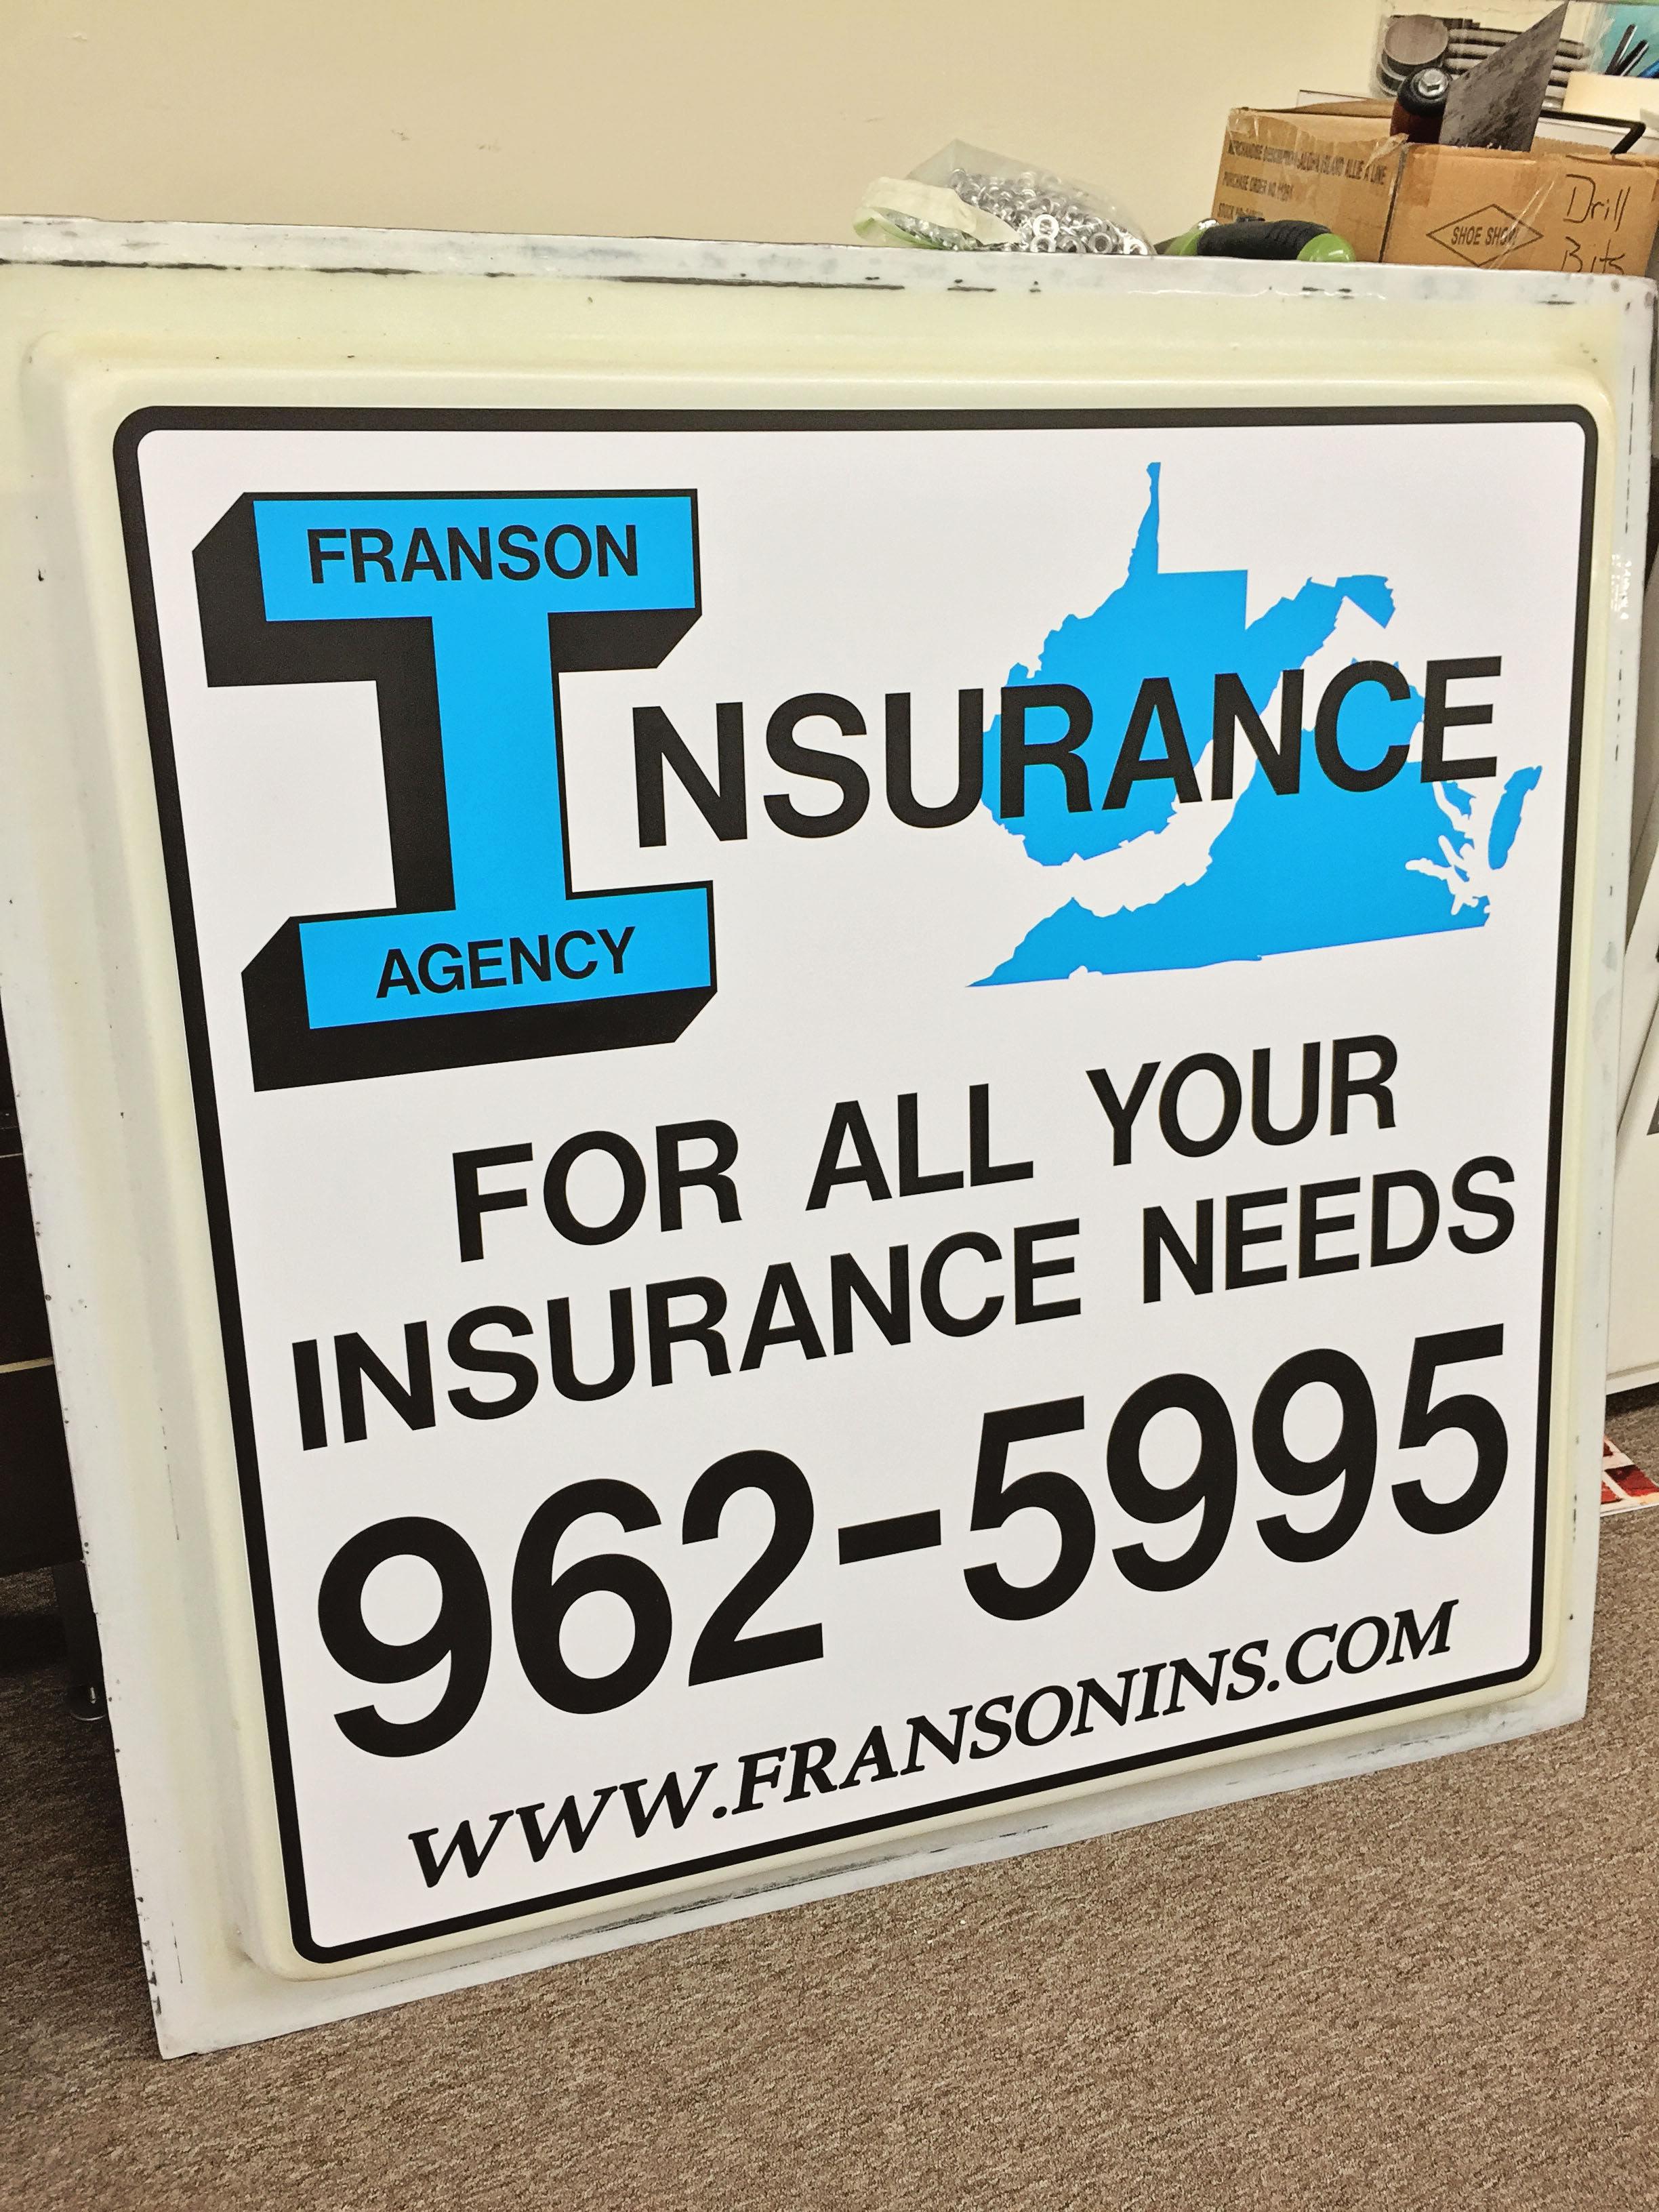 Insurance custom-made sign in Covington, VA